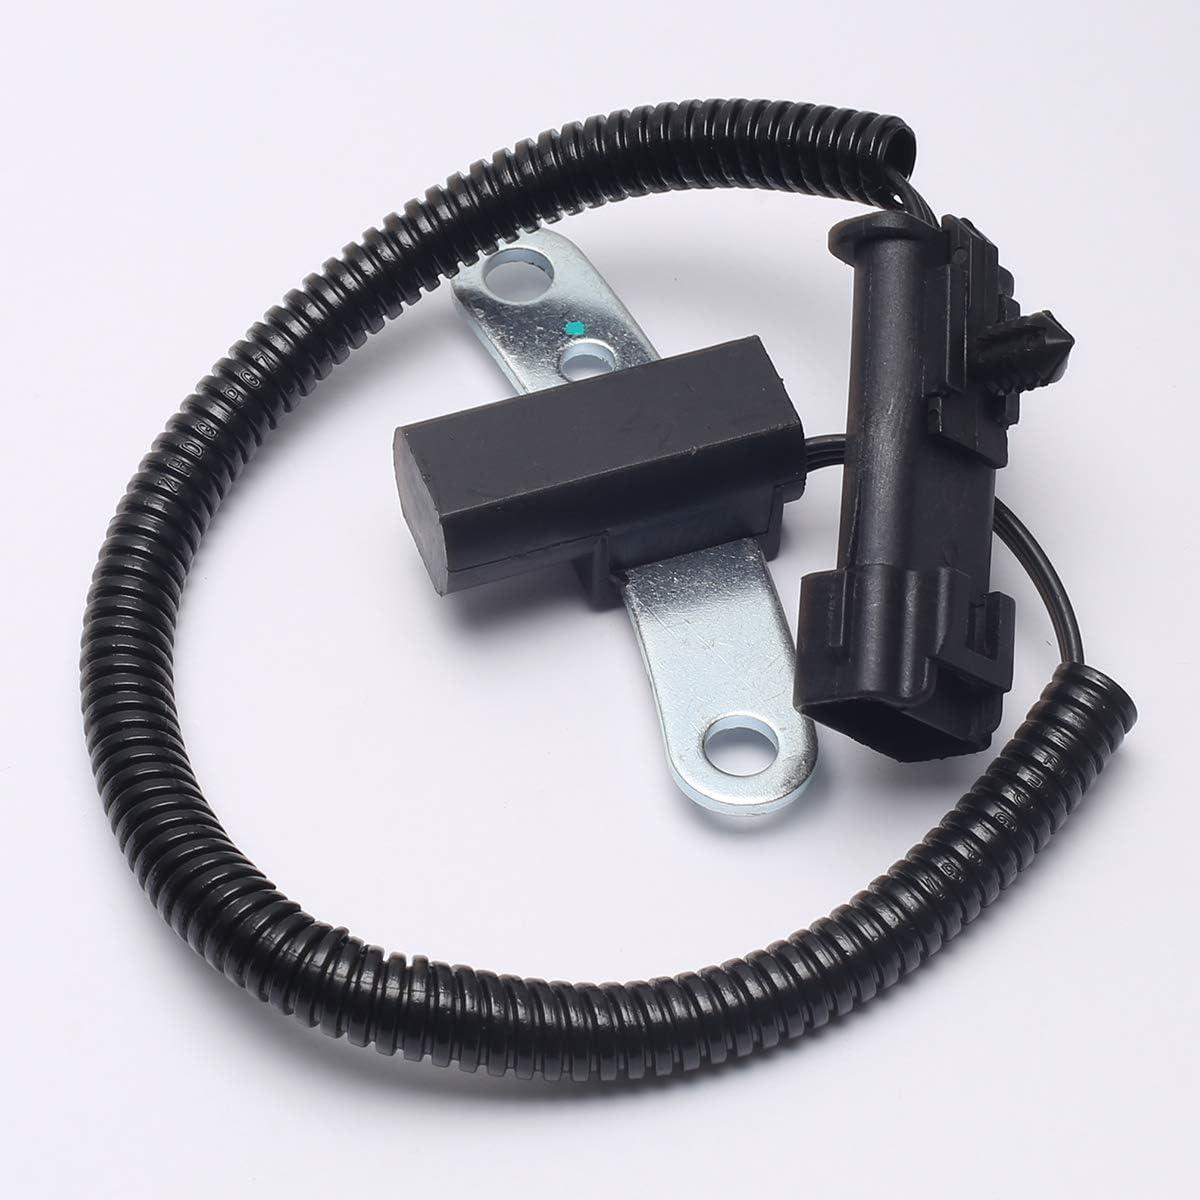 Crankshaft Position Sensor for 1994-2004 Dodge Dakota Jeep Cherokee TJ Wrangler 2.5L Replace 56027865AB 56027865 SU3026 56027865AB 56027866 56027867AB 56041819AA 5S1717 PC169 96140 1802-247746